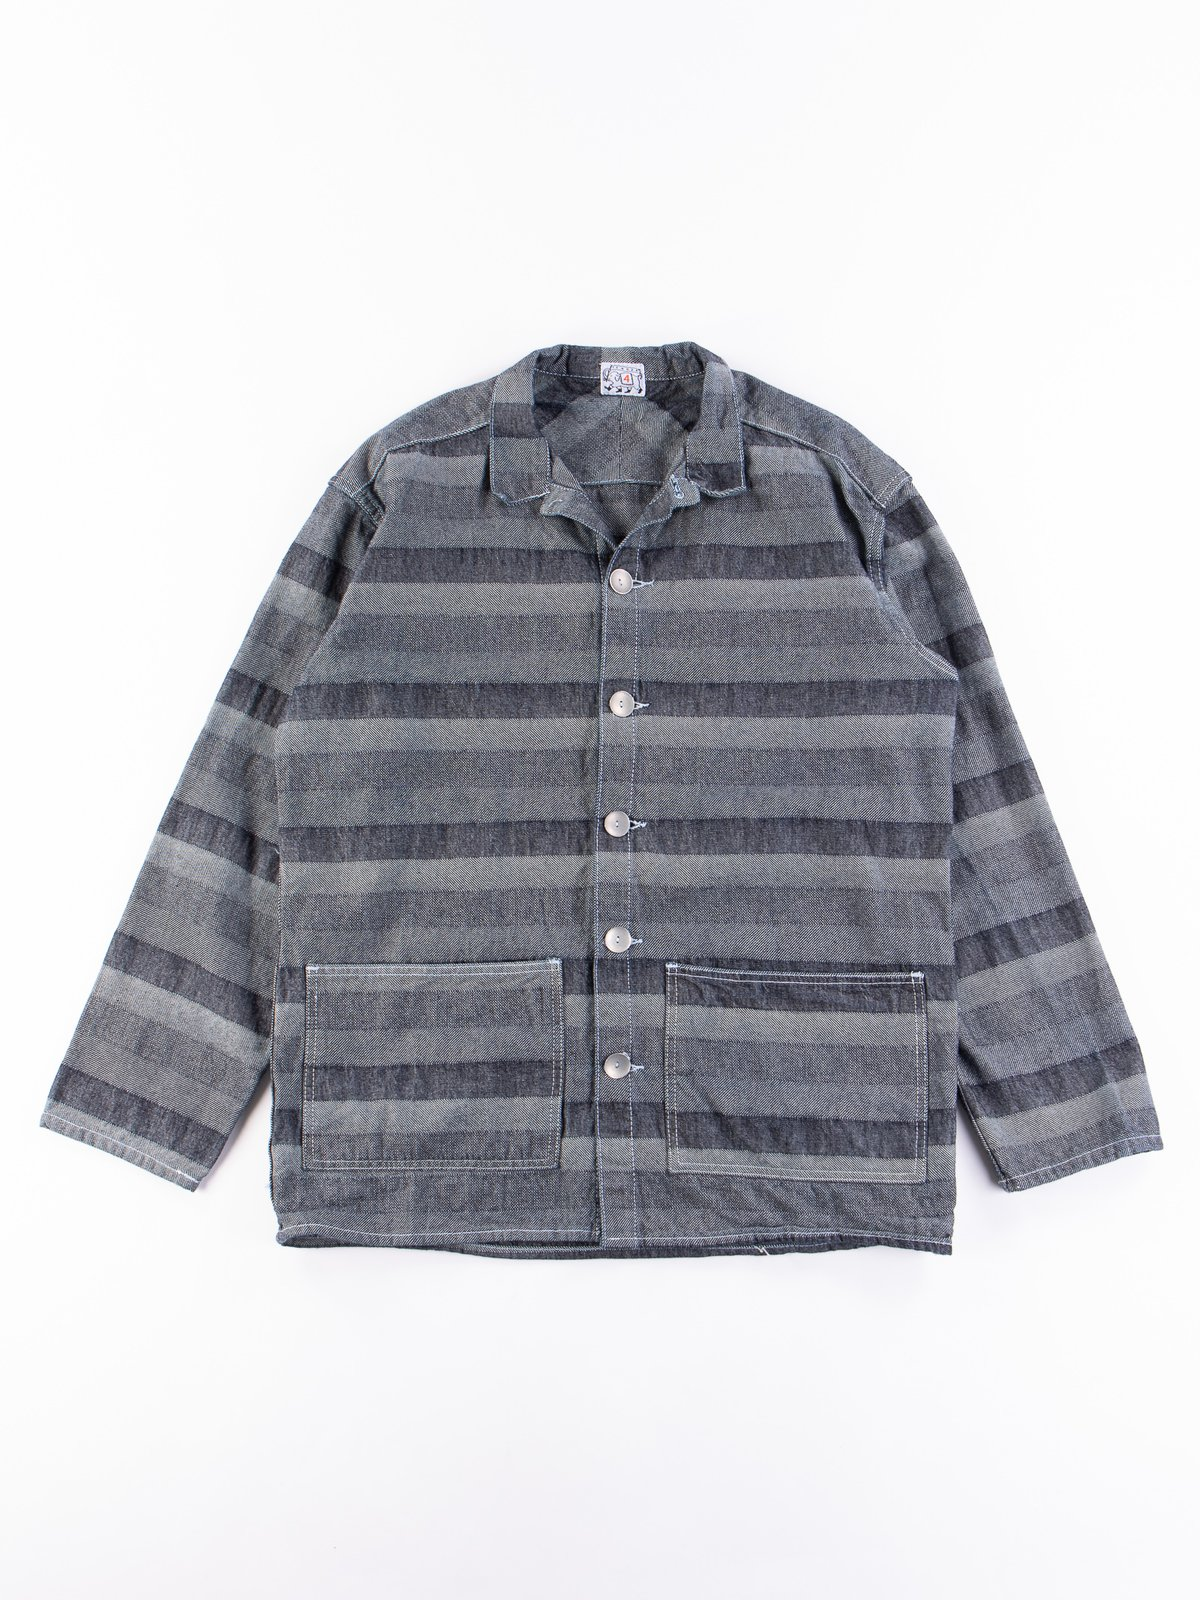 Rinse Washed Indigo Weaver's Blanket Stripe Floor Shirt - Image 1